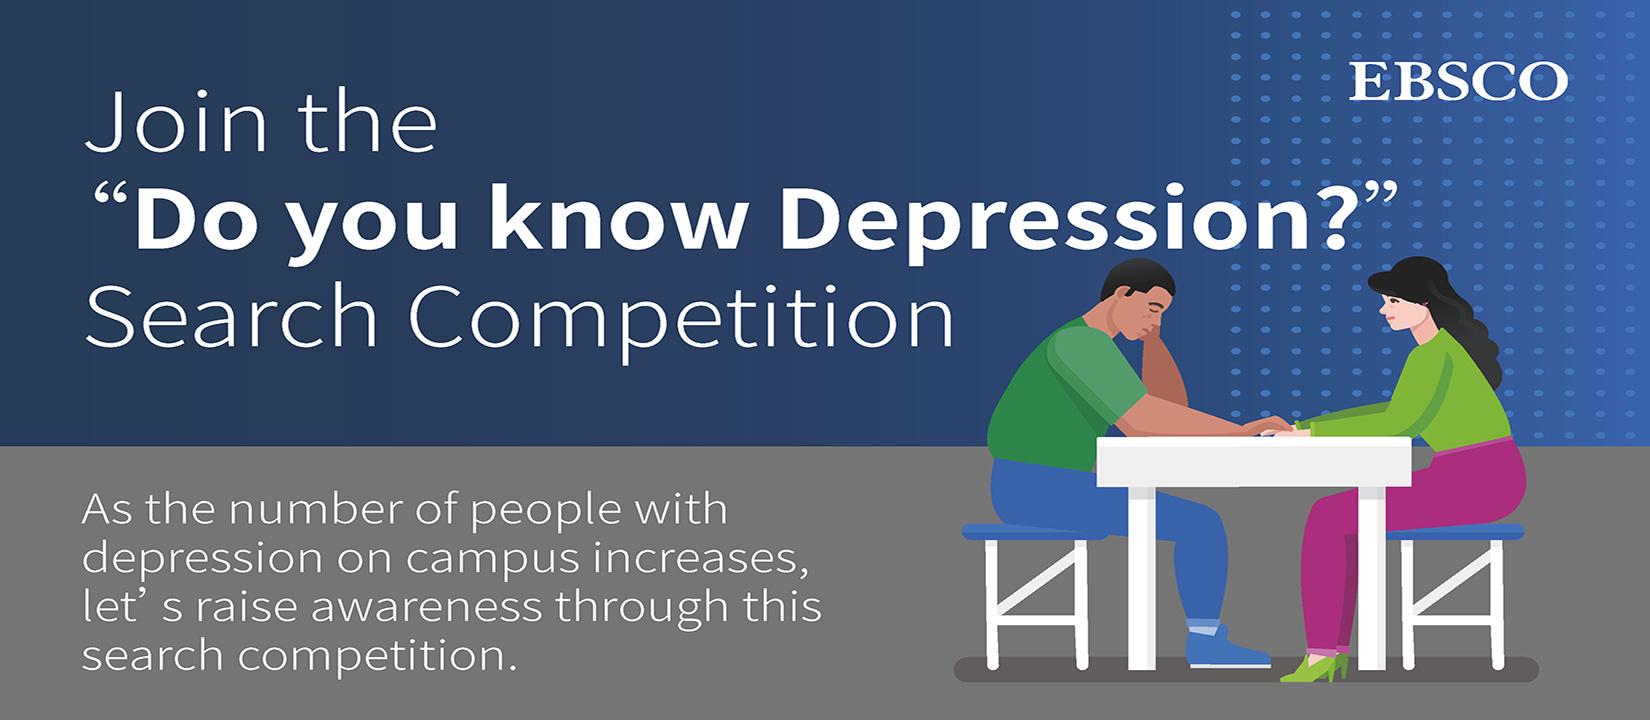 EBSCO Online Quiz: Do You Know Depression?